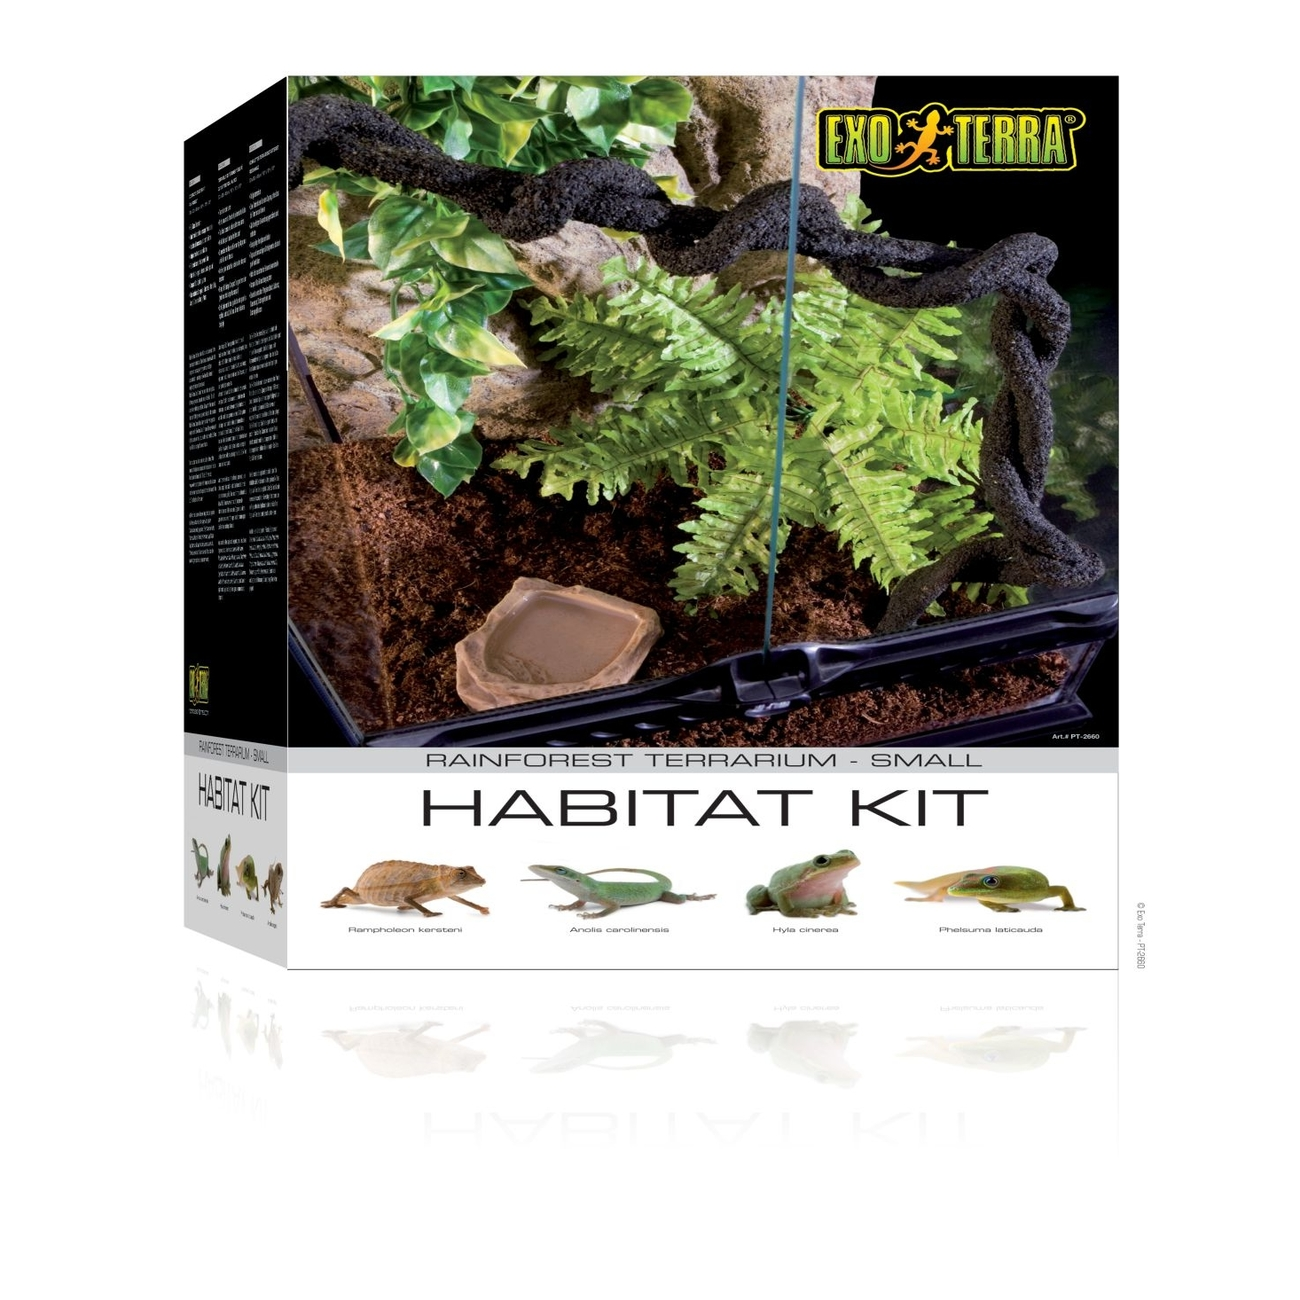 Hagen Exo Terra - Rainforest Habitat Kit, Gr.S - 30 x 45 x 30 cm